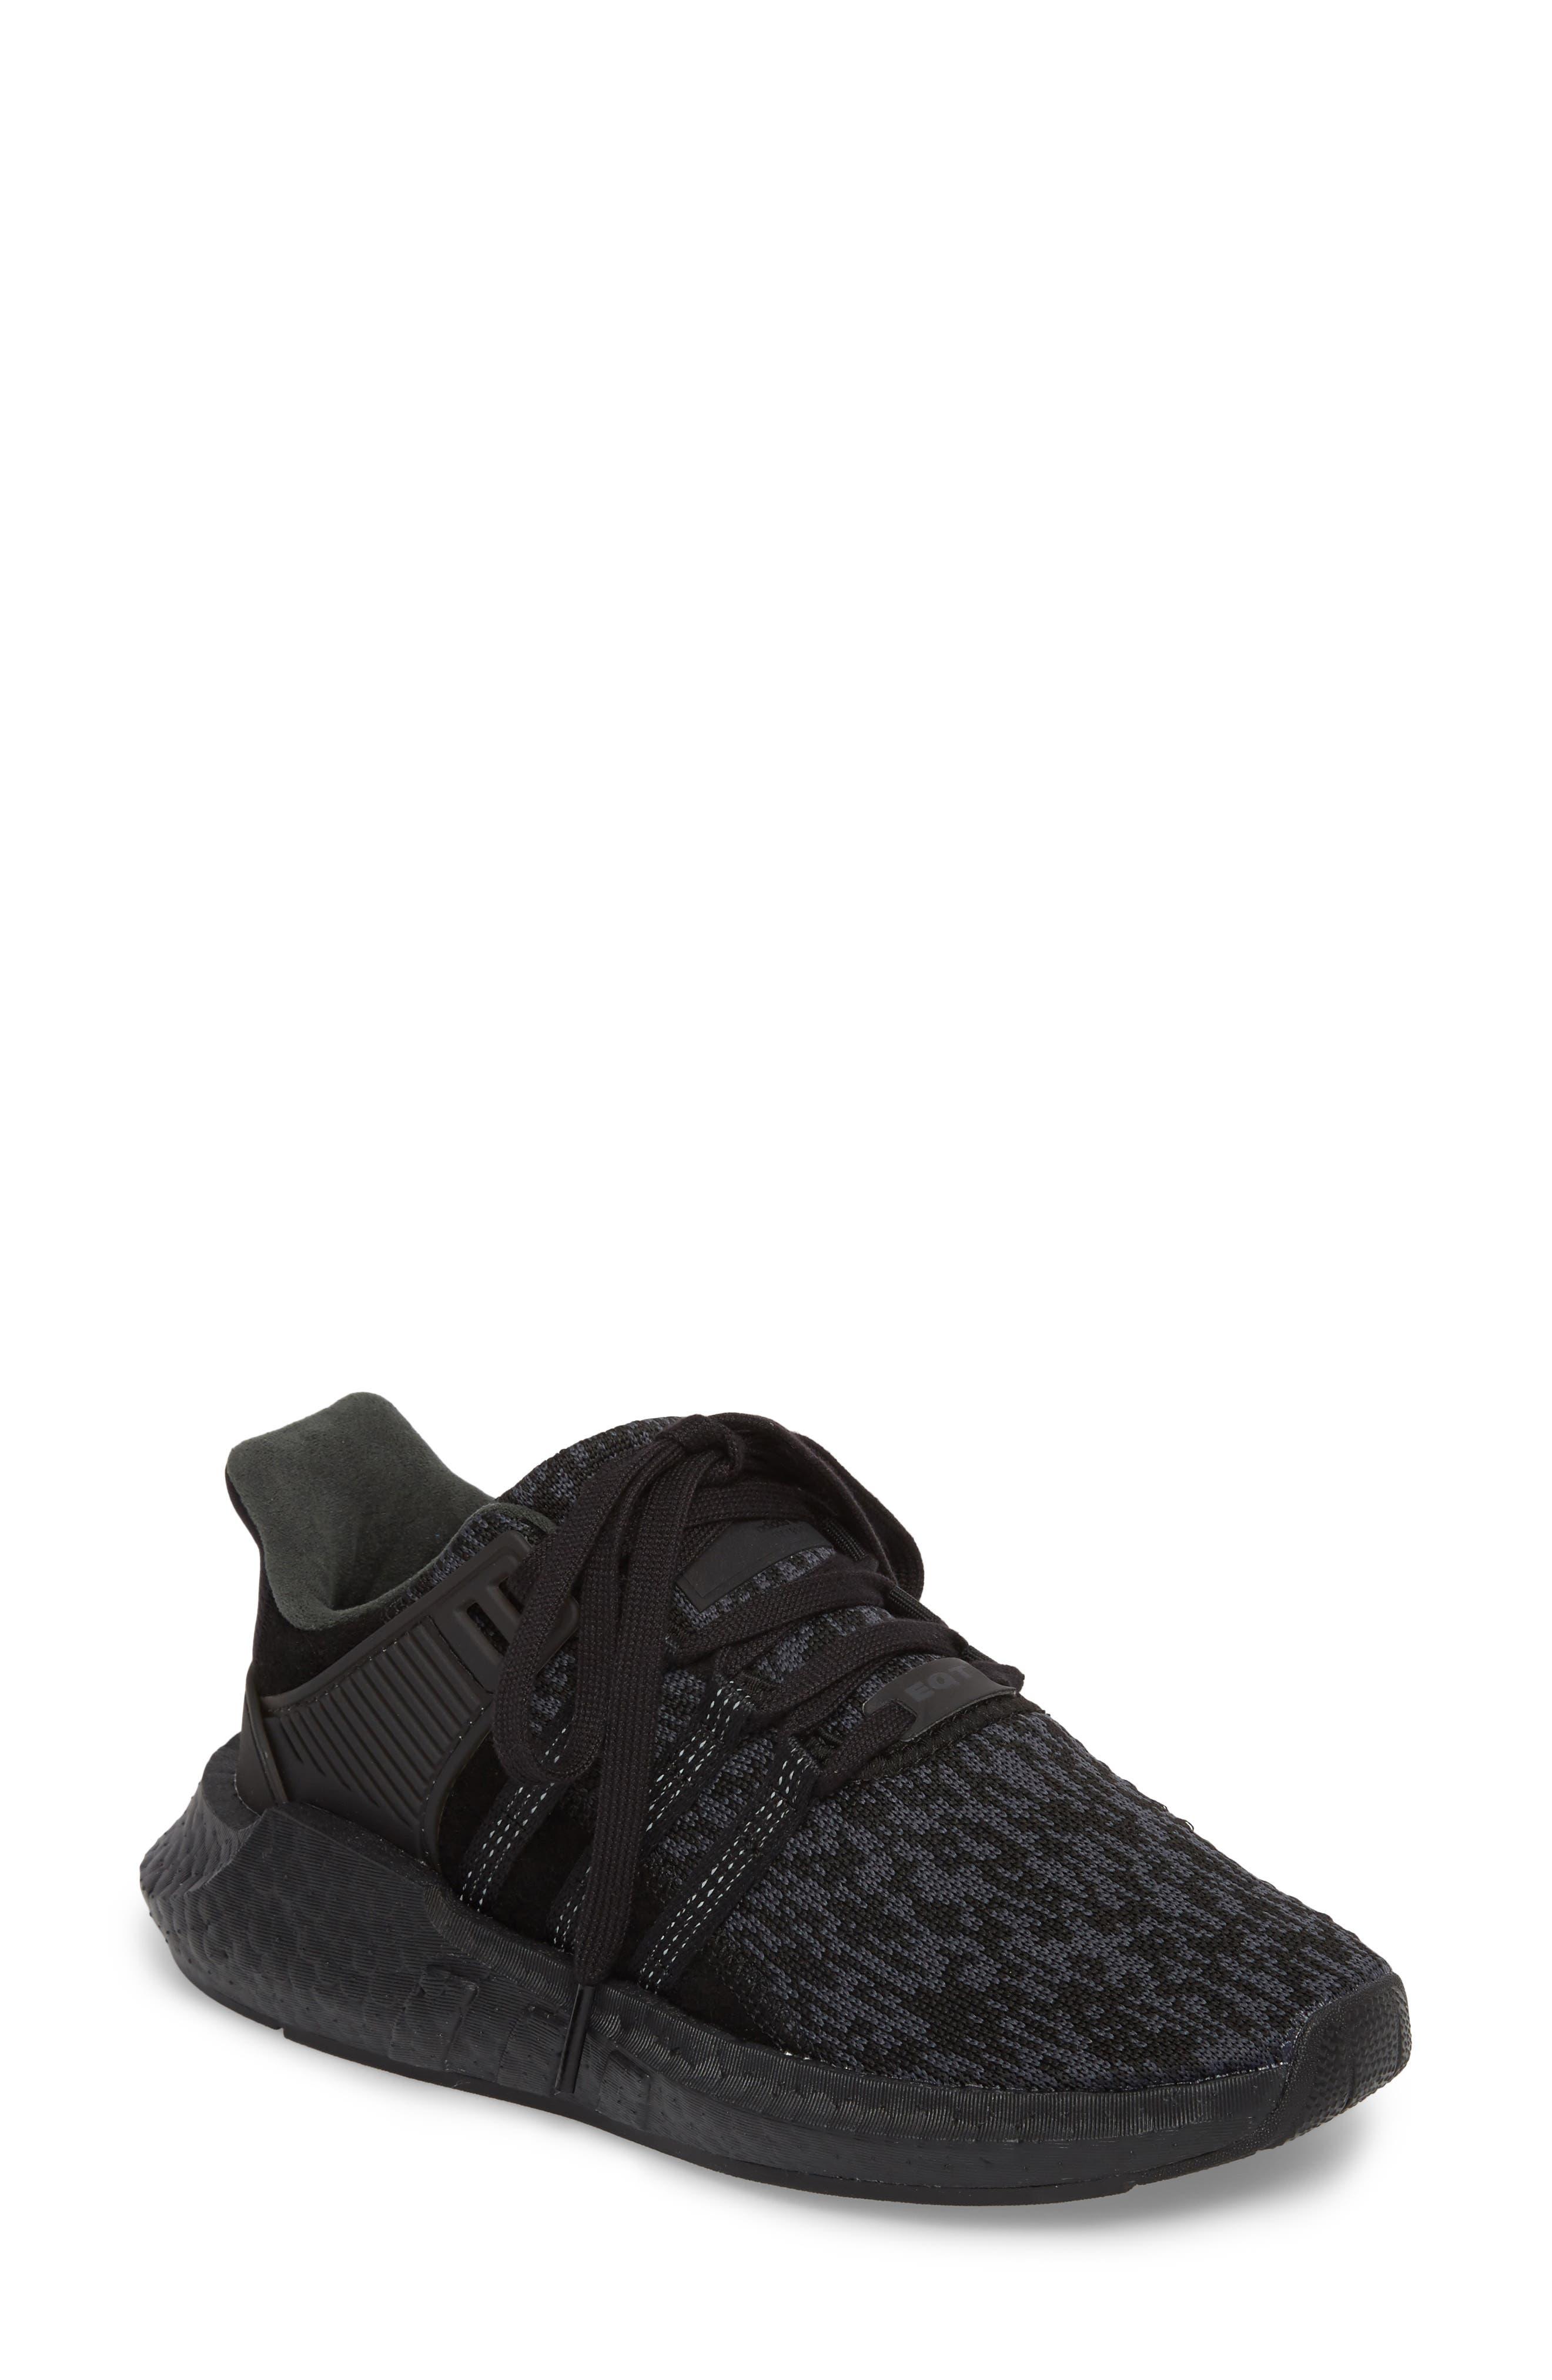 EQT Support 93/17 Sneaker,                             Main thumbnail 2, color,